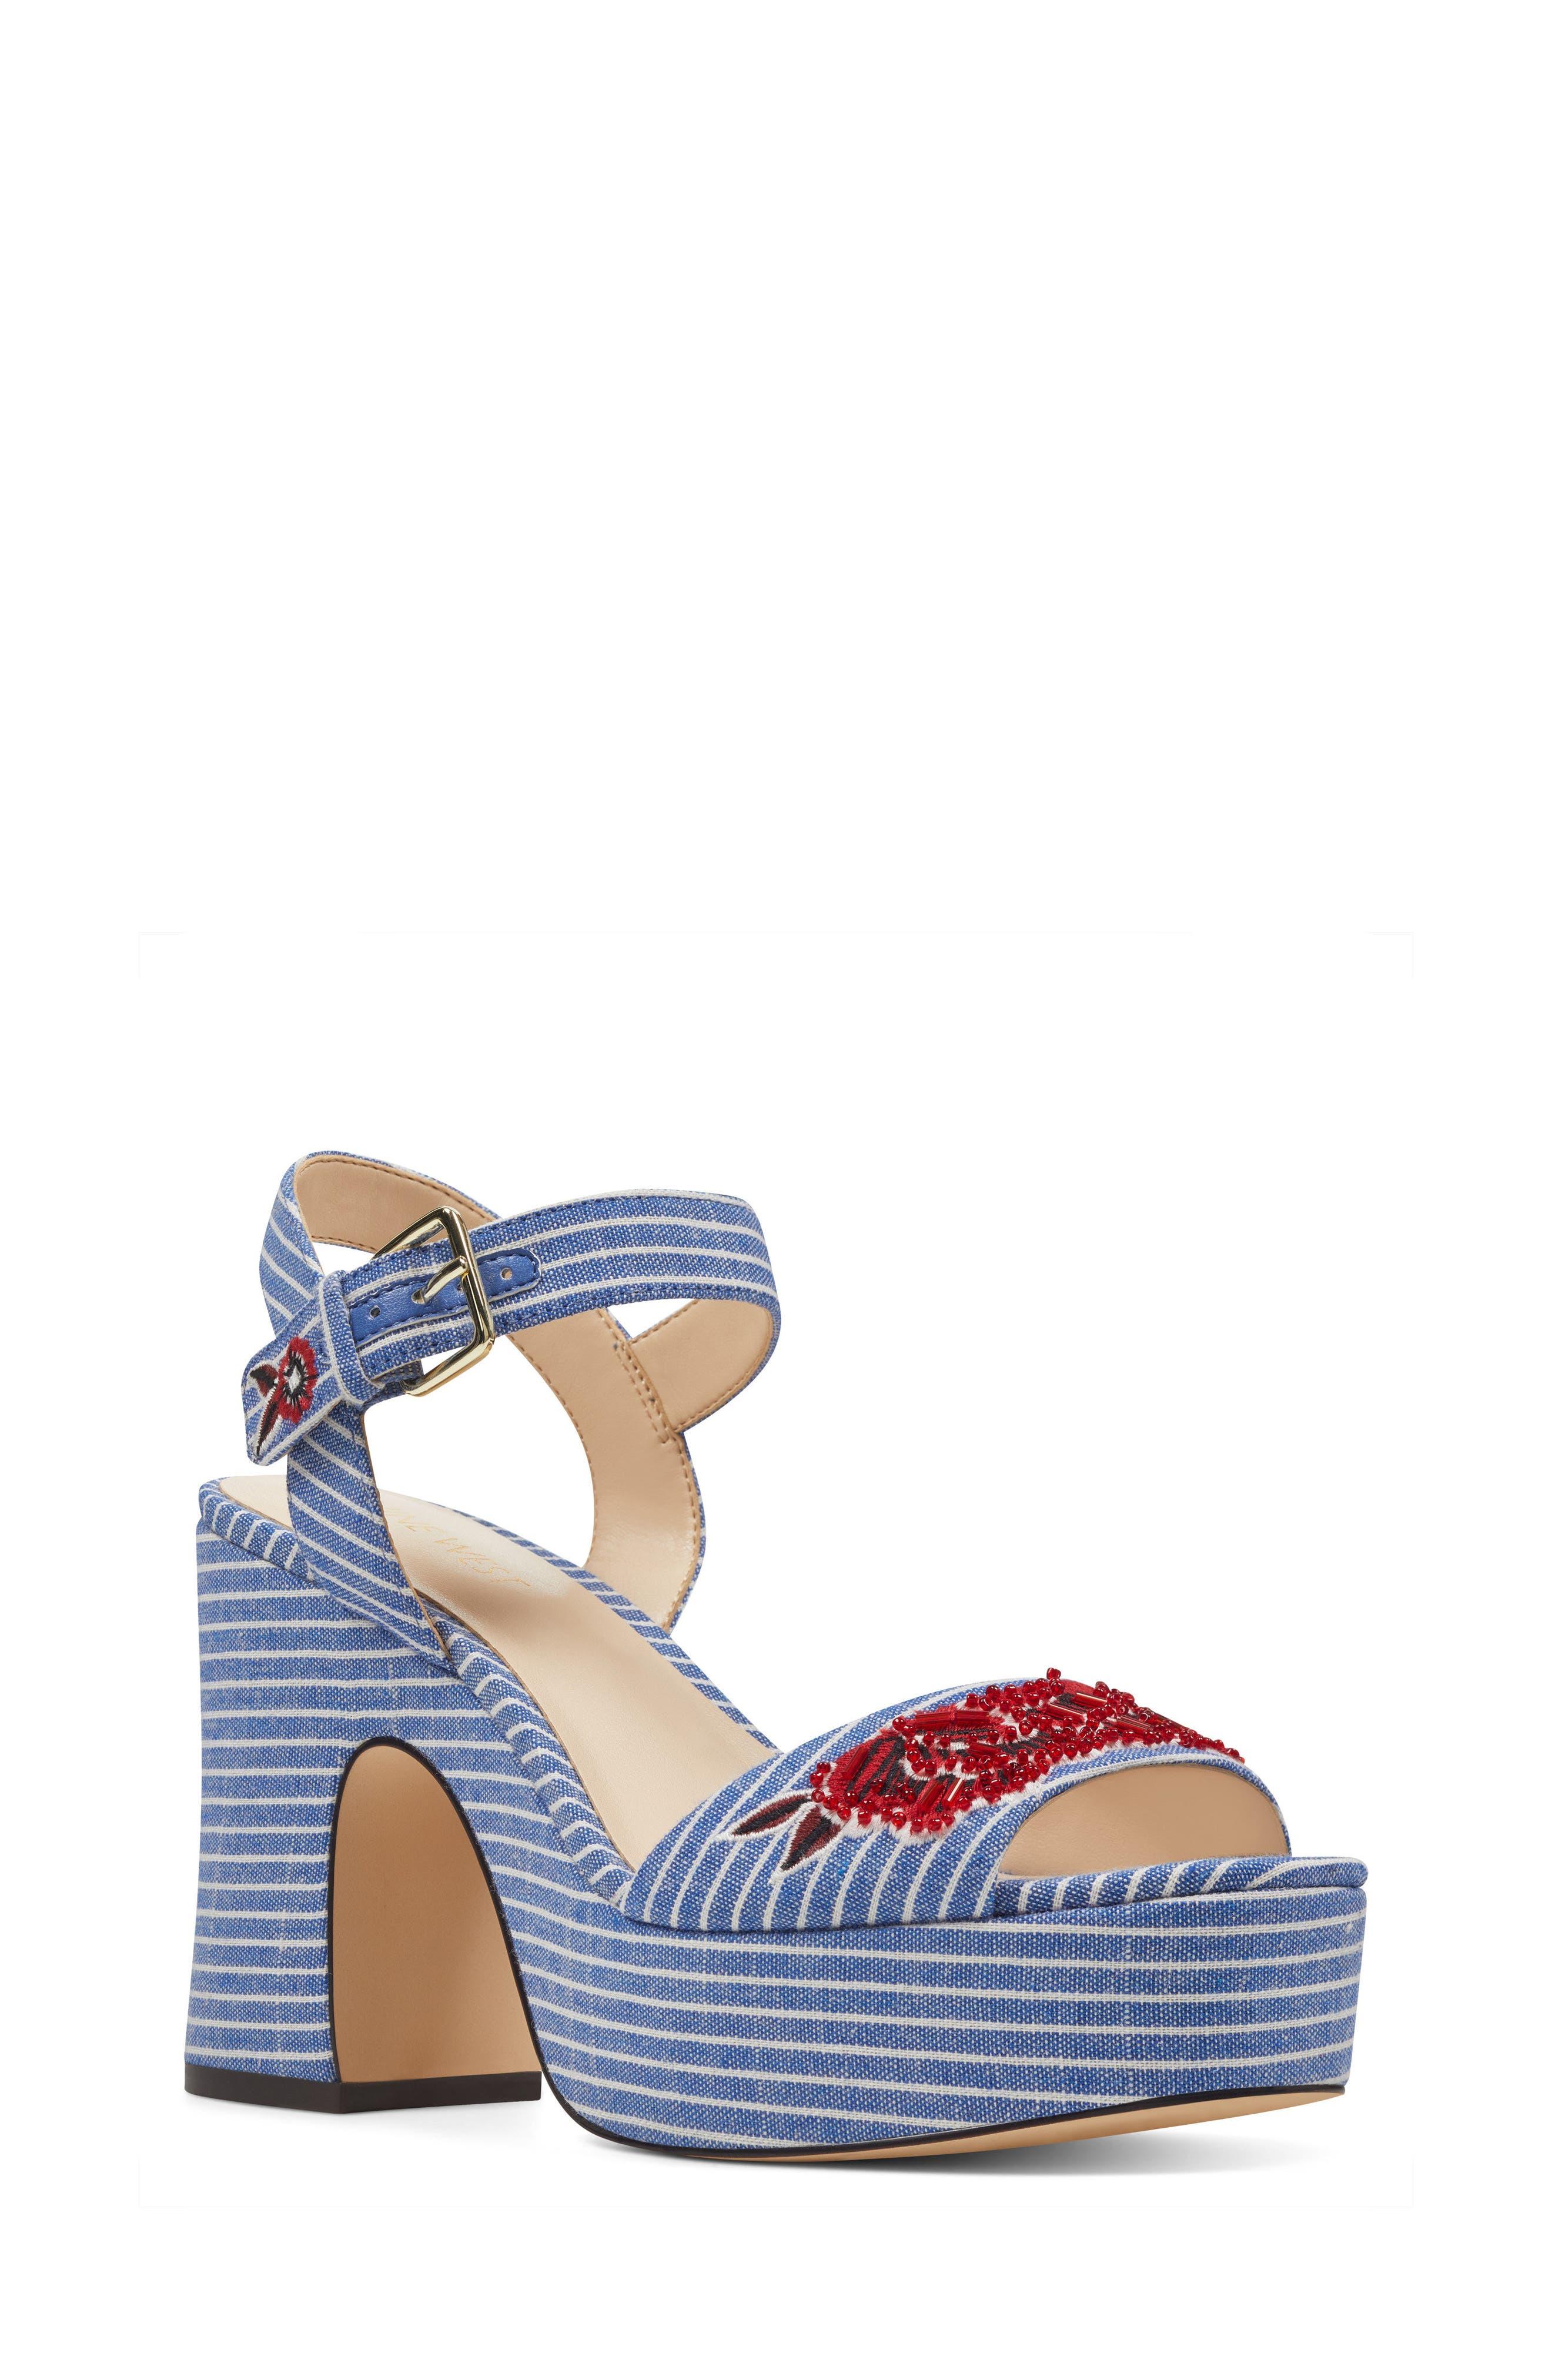 Fontayah Platform Sandal,                         Main,                         color, Blue/ White Fabric